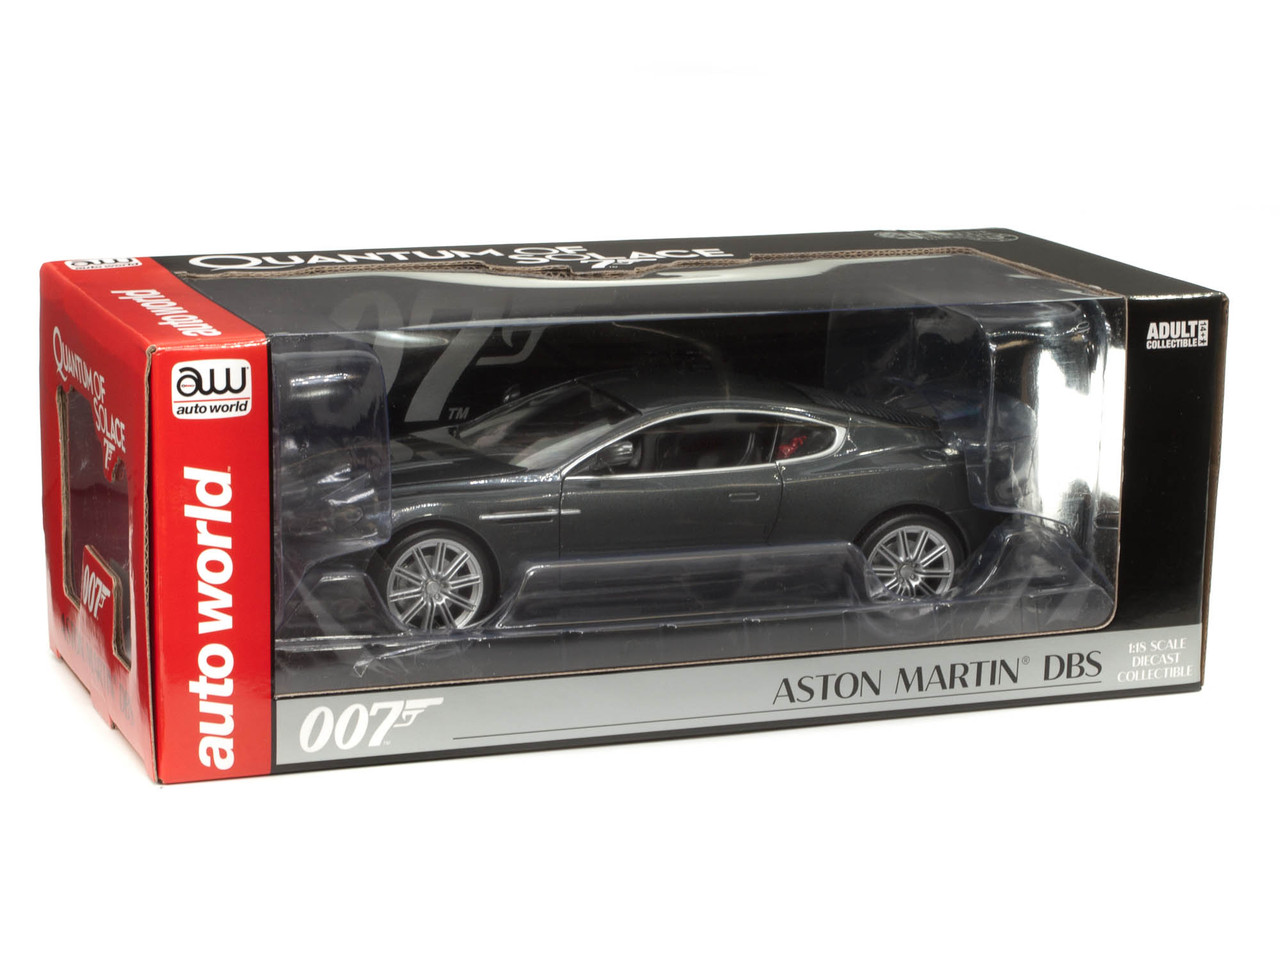 James Bond 007 Aston Martin Dbs Quantum Of Solace 1 18 Scale Awss123